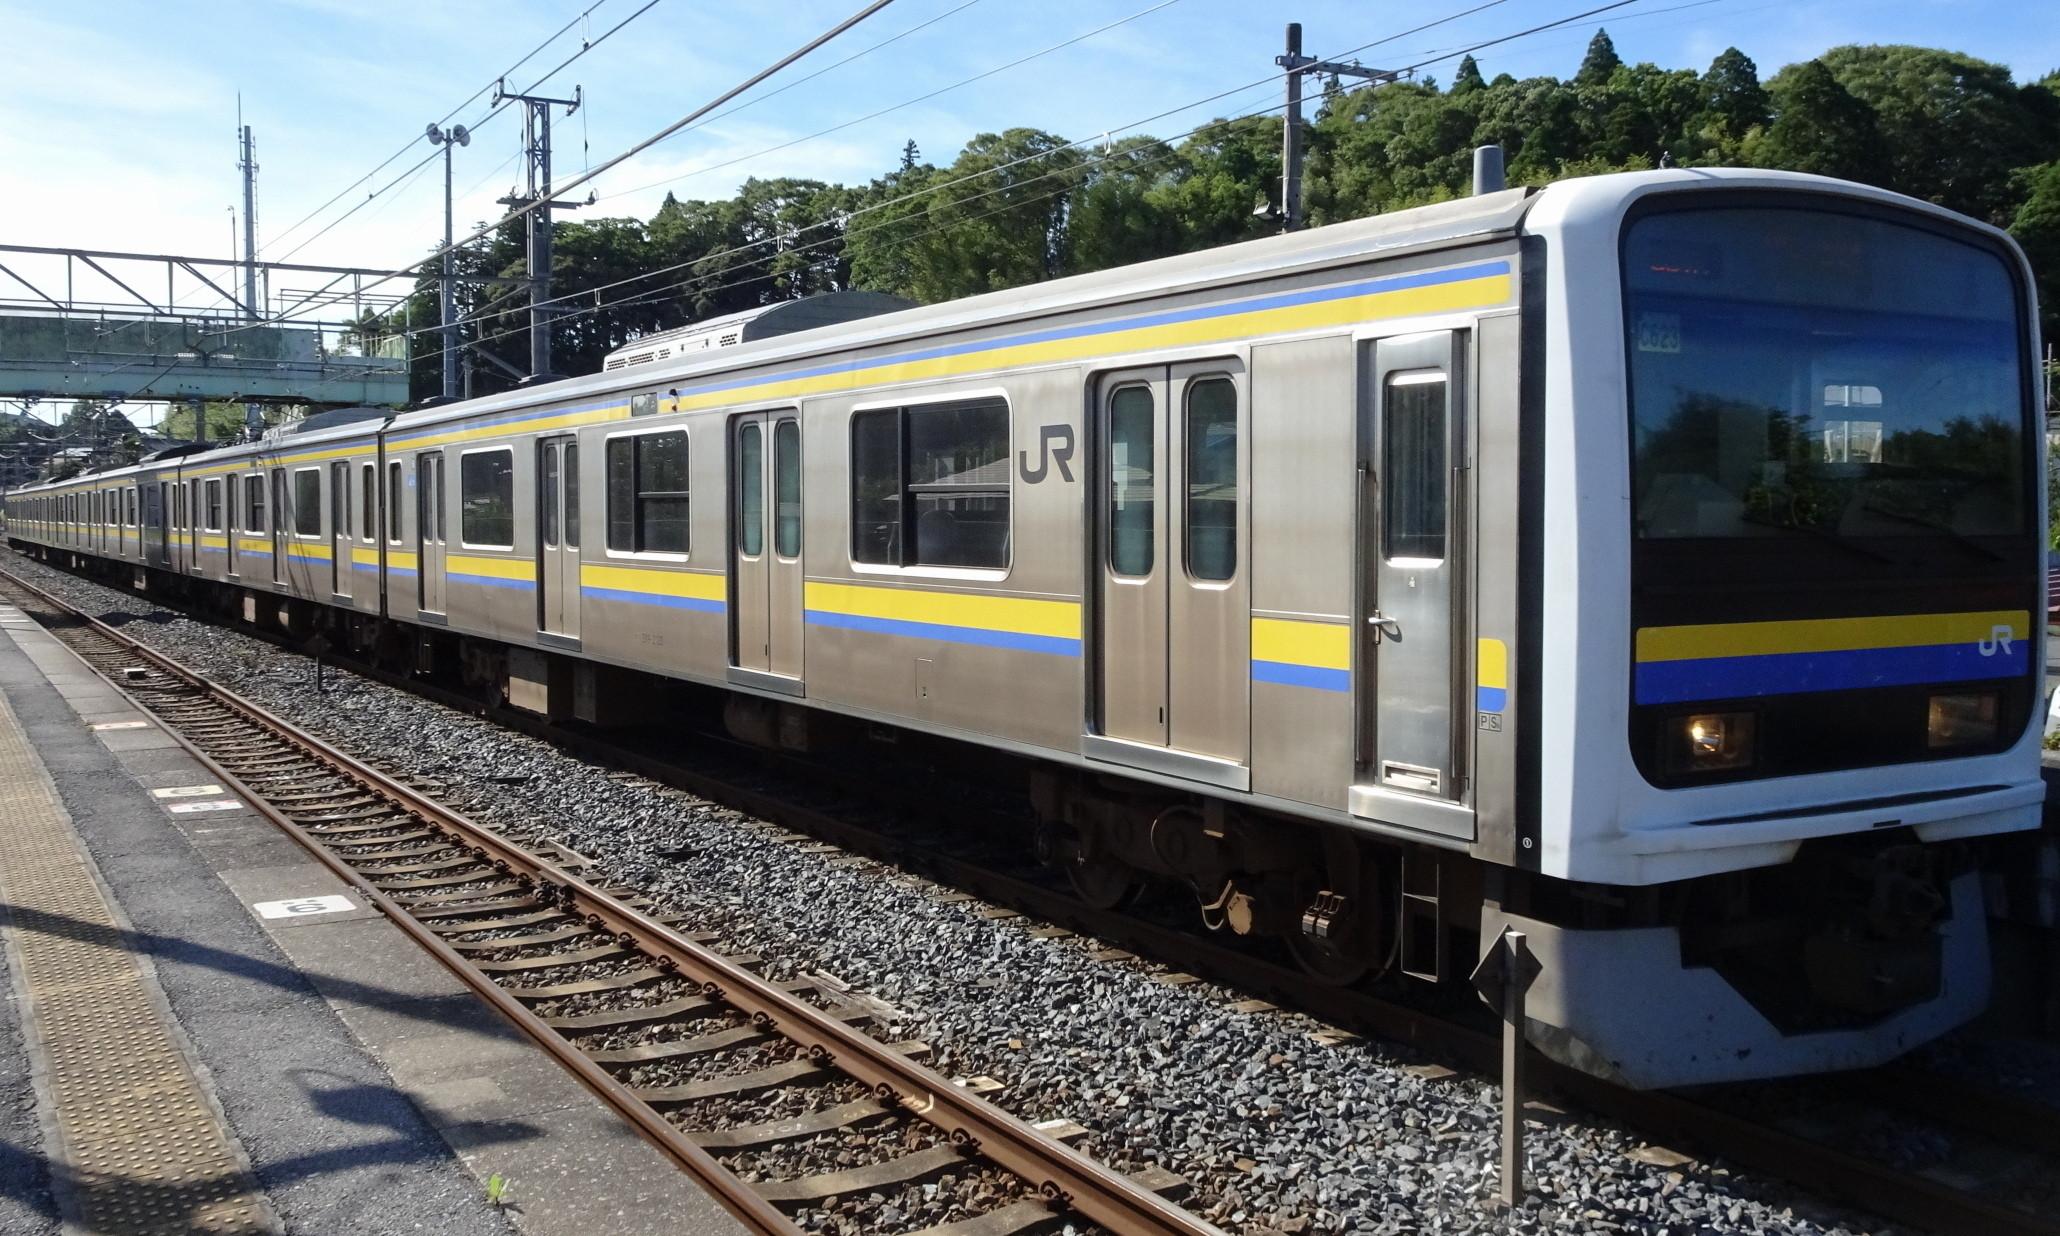 JR_East_209_Series(Sobu_Line)